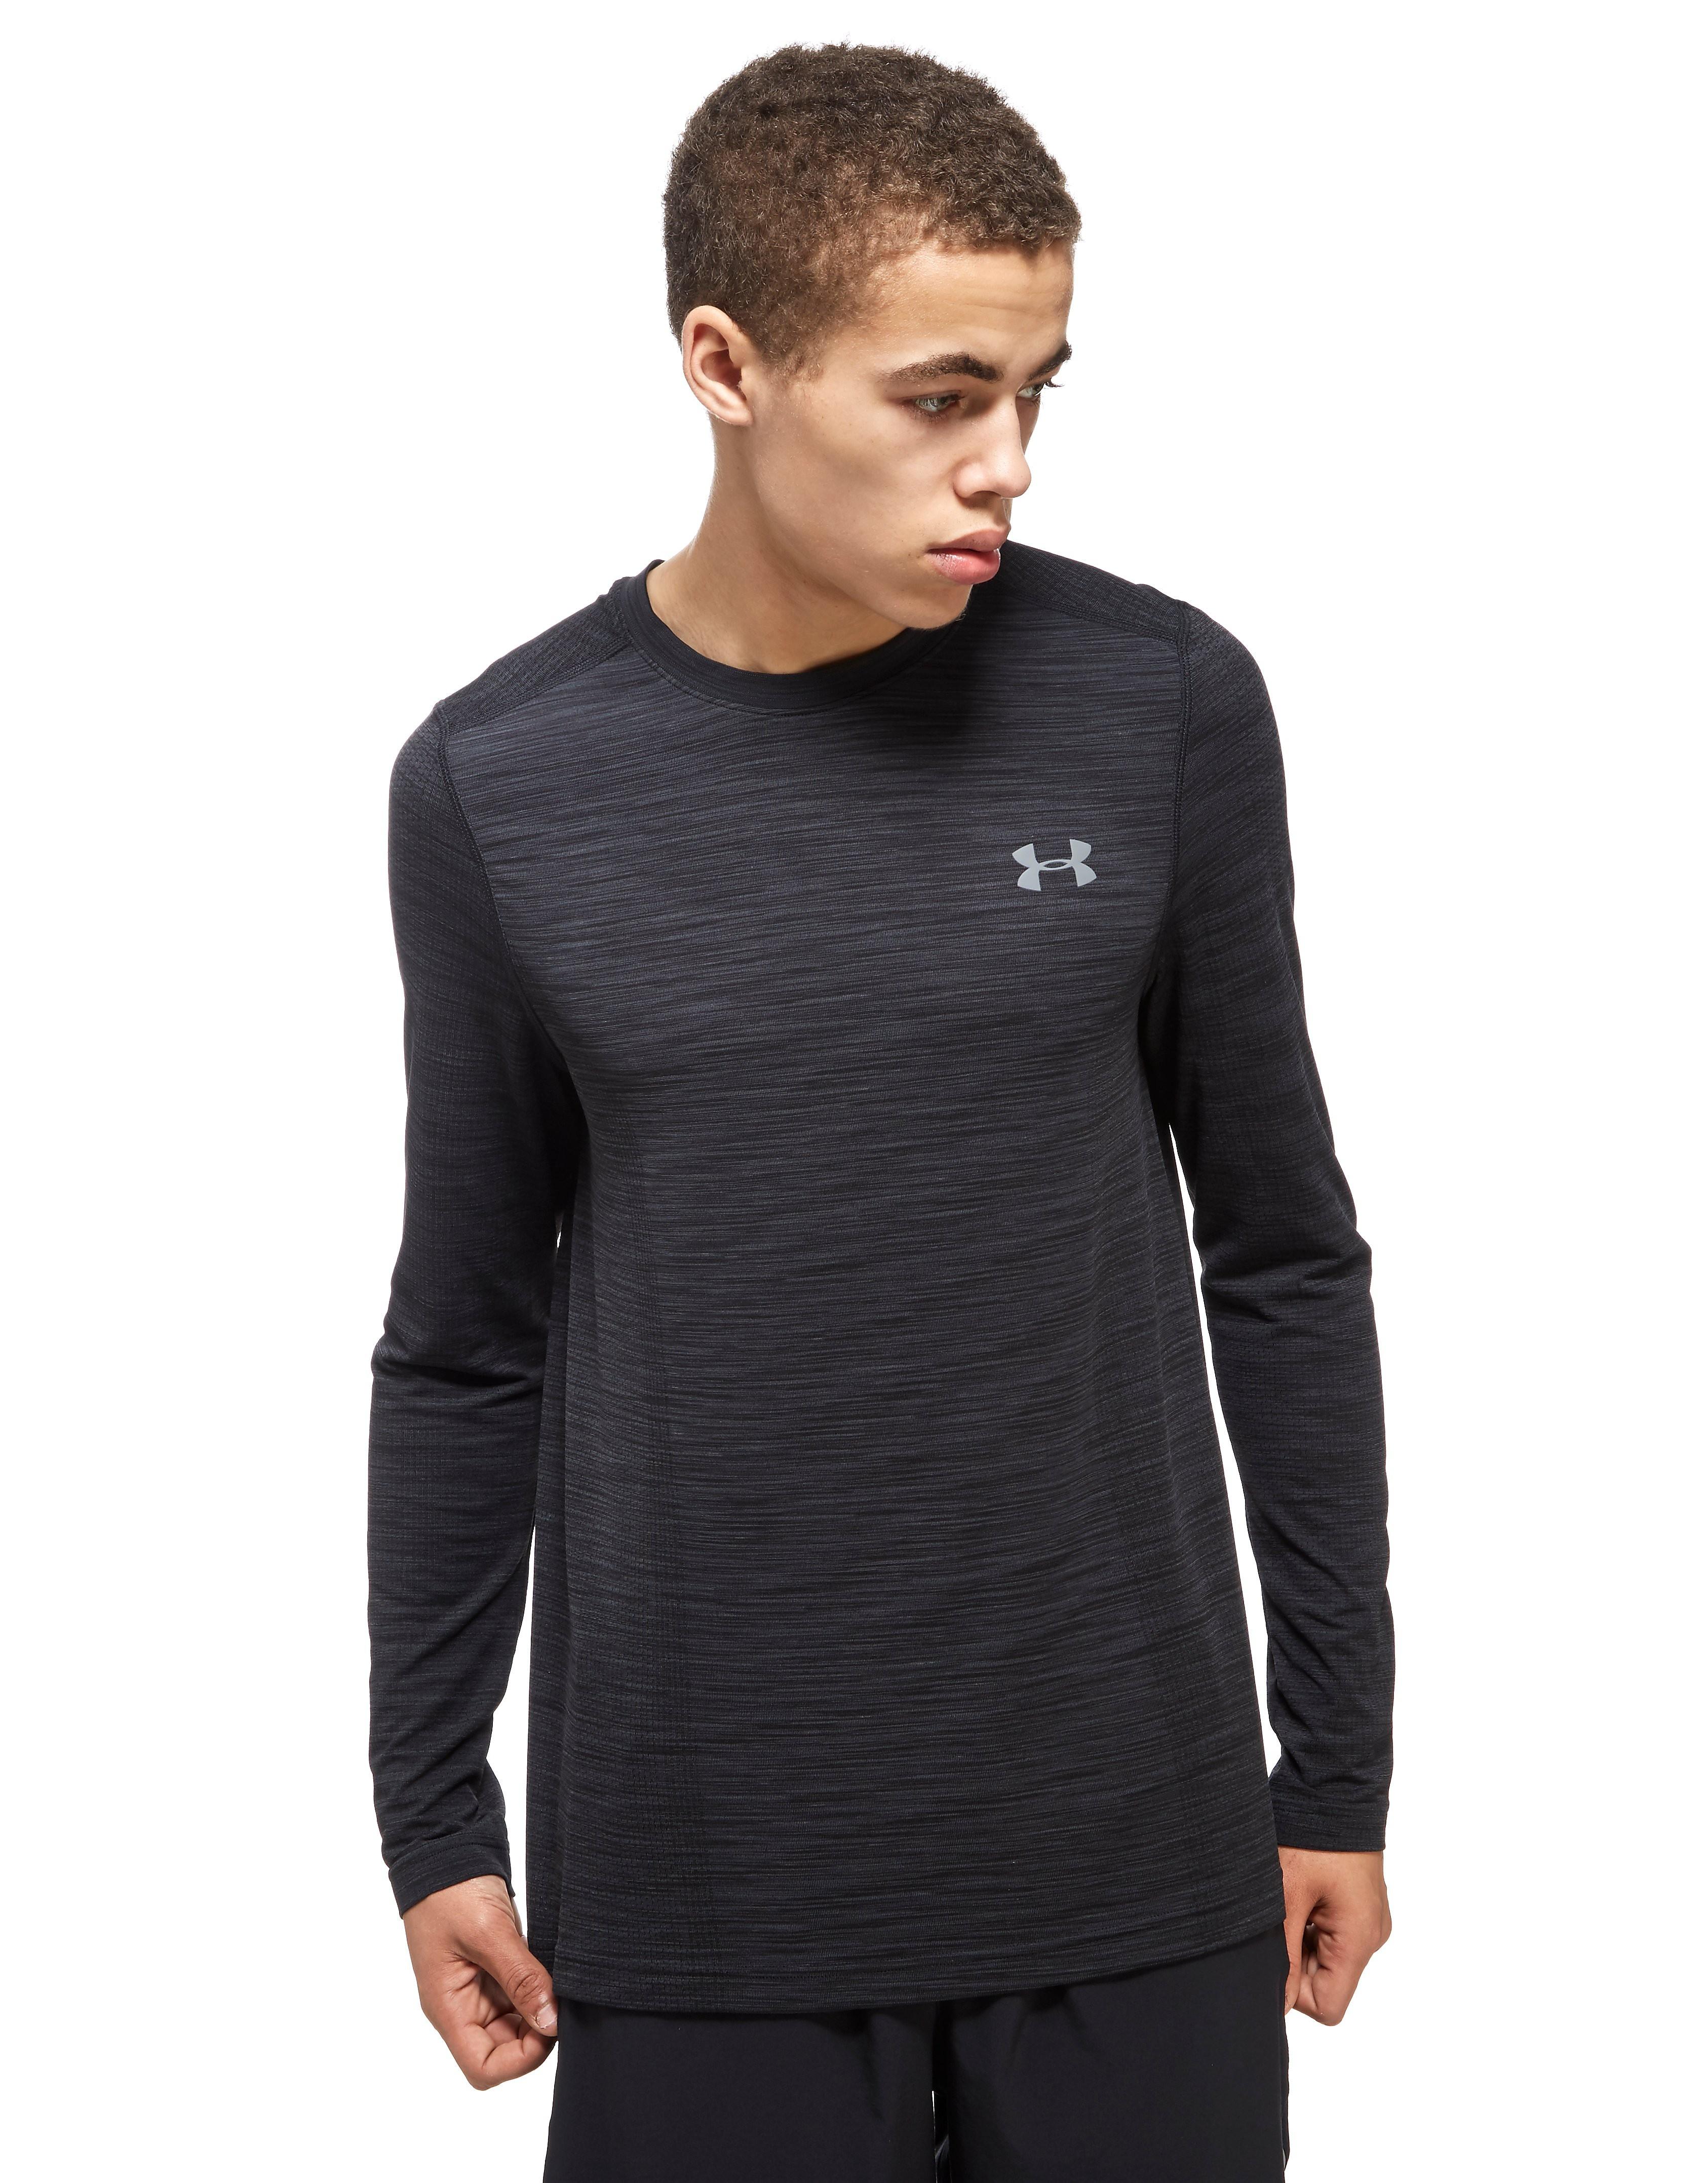 Under Armour Threadborne Long-Sleeved T-Shirt